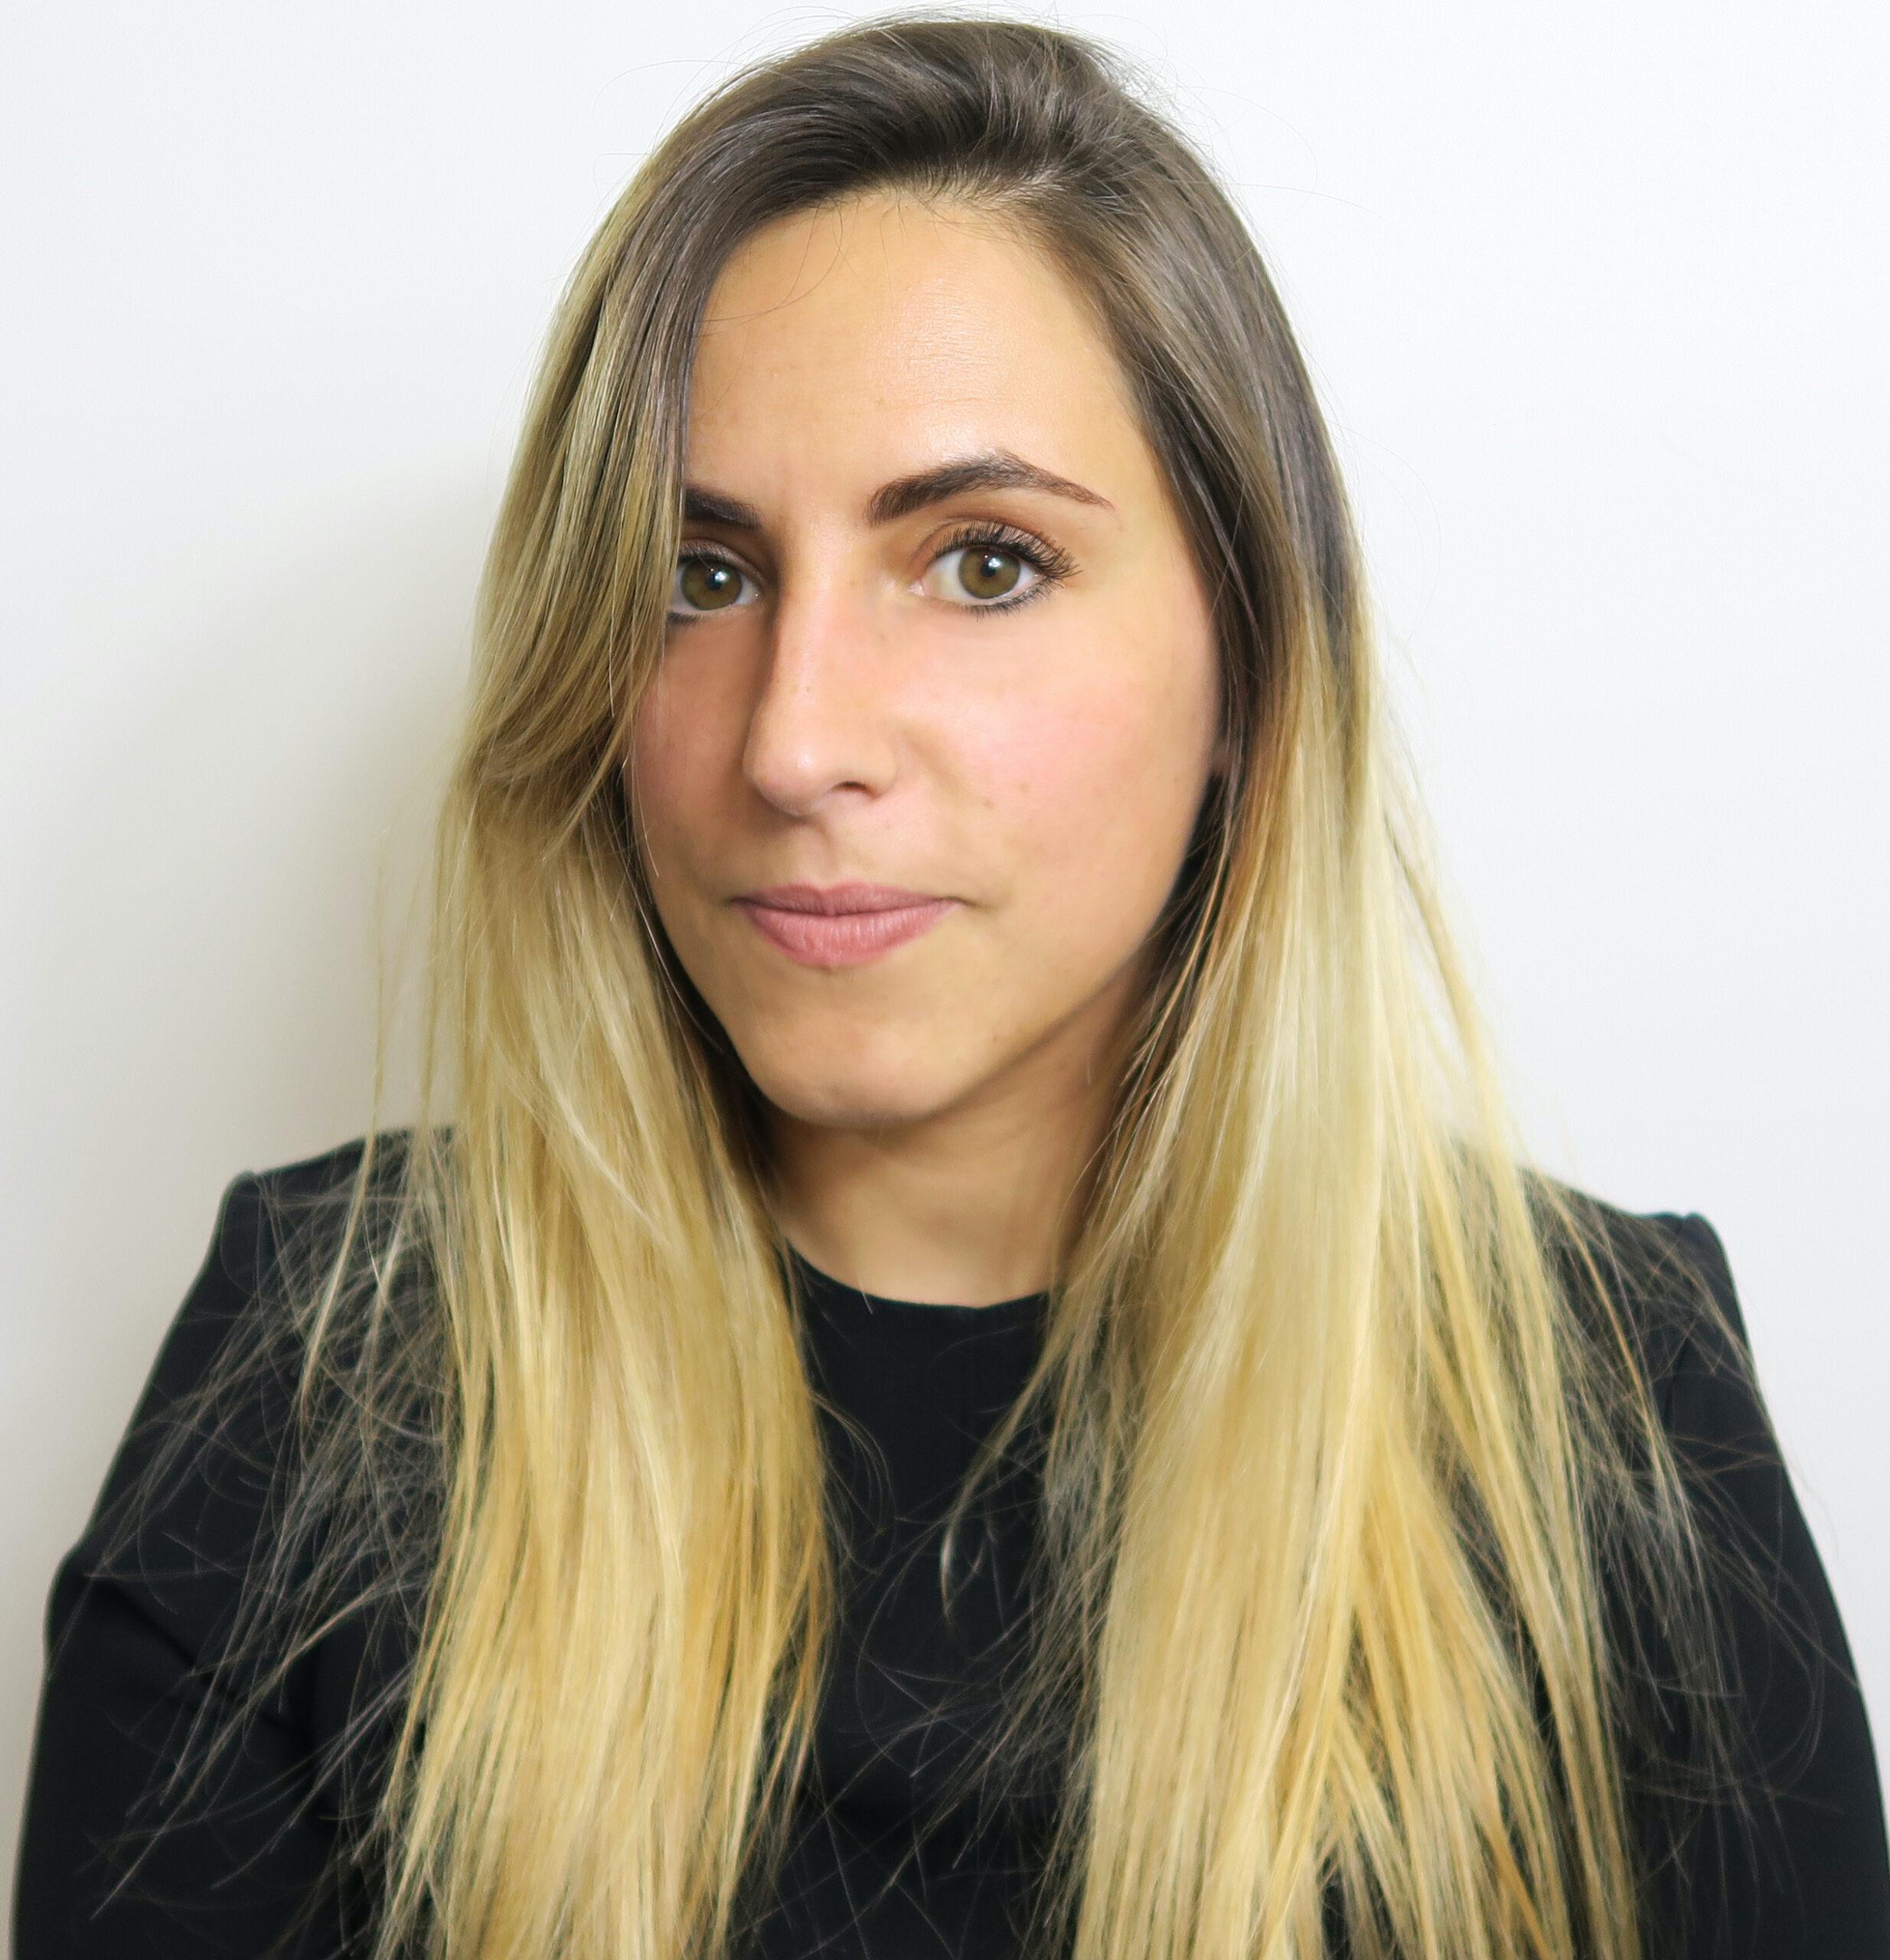 Mathilda Murcia